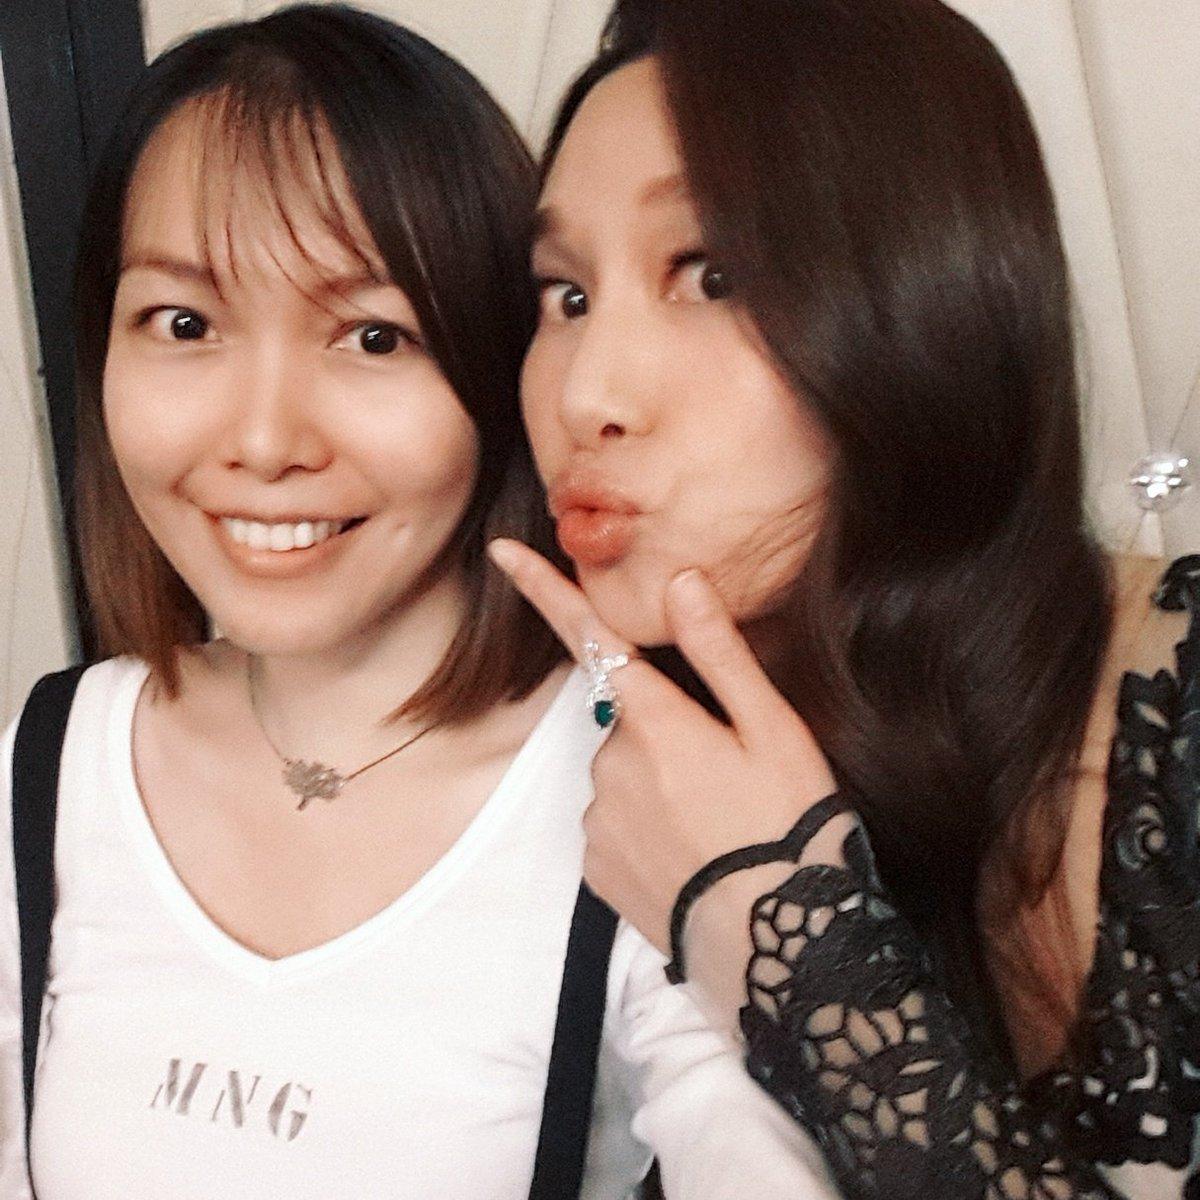 Having fun while working #throwback #hongkong #actress #tvb #selfie #backstage #katetsui #徐子珊<br>http://pic.twitter.com/28CK7B9mje